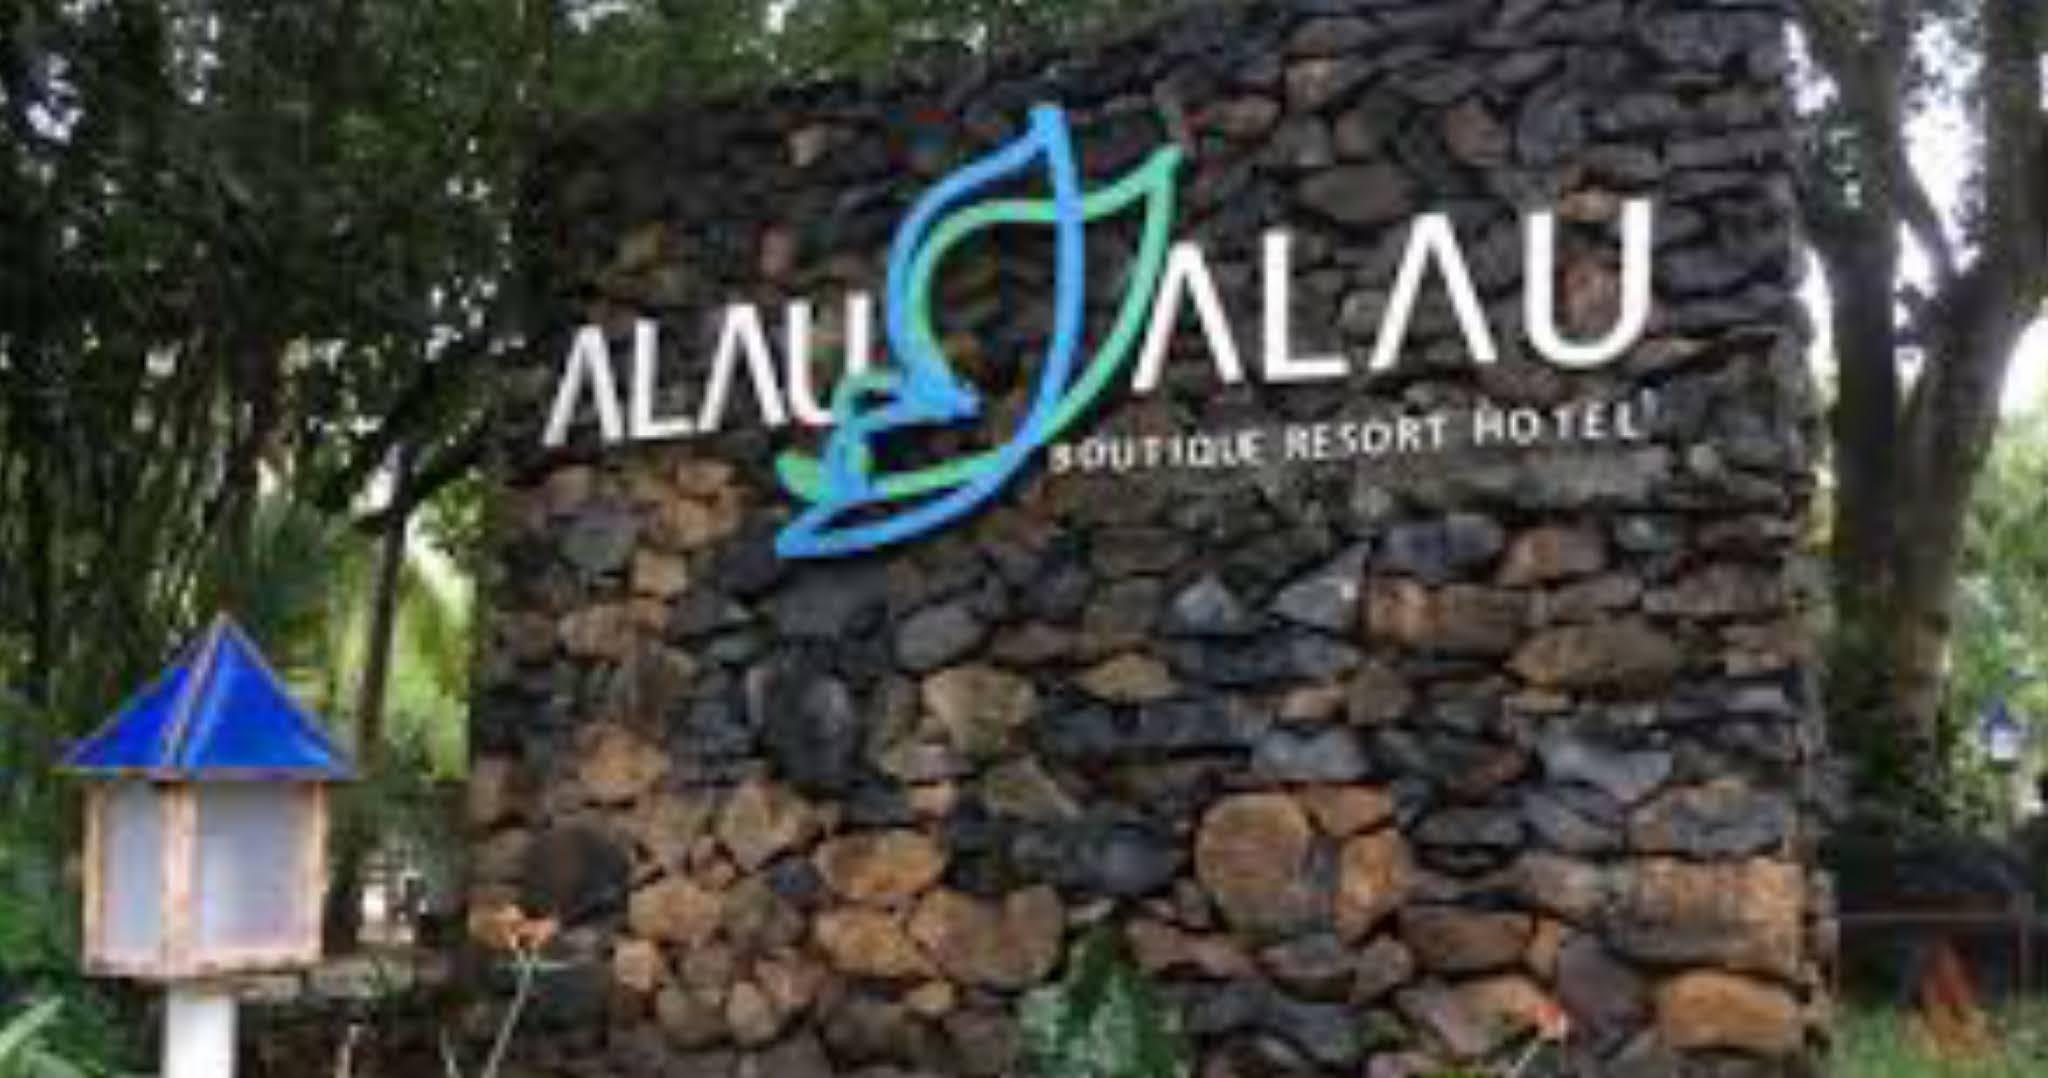 Pesona Tempat Wisata Pantai Alau Alau Boutique Resort kalianda lampung